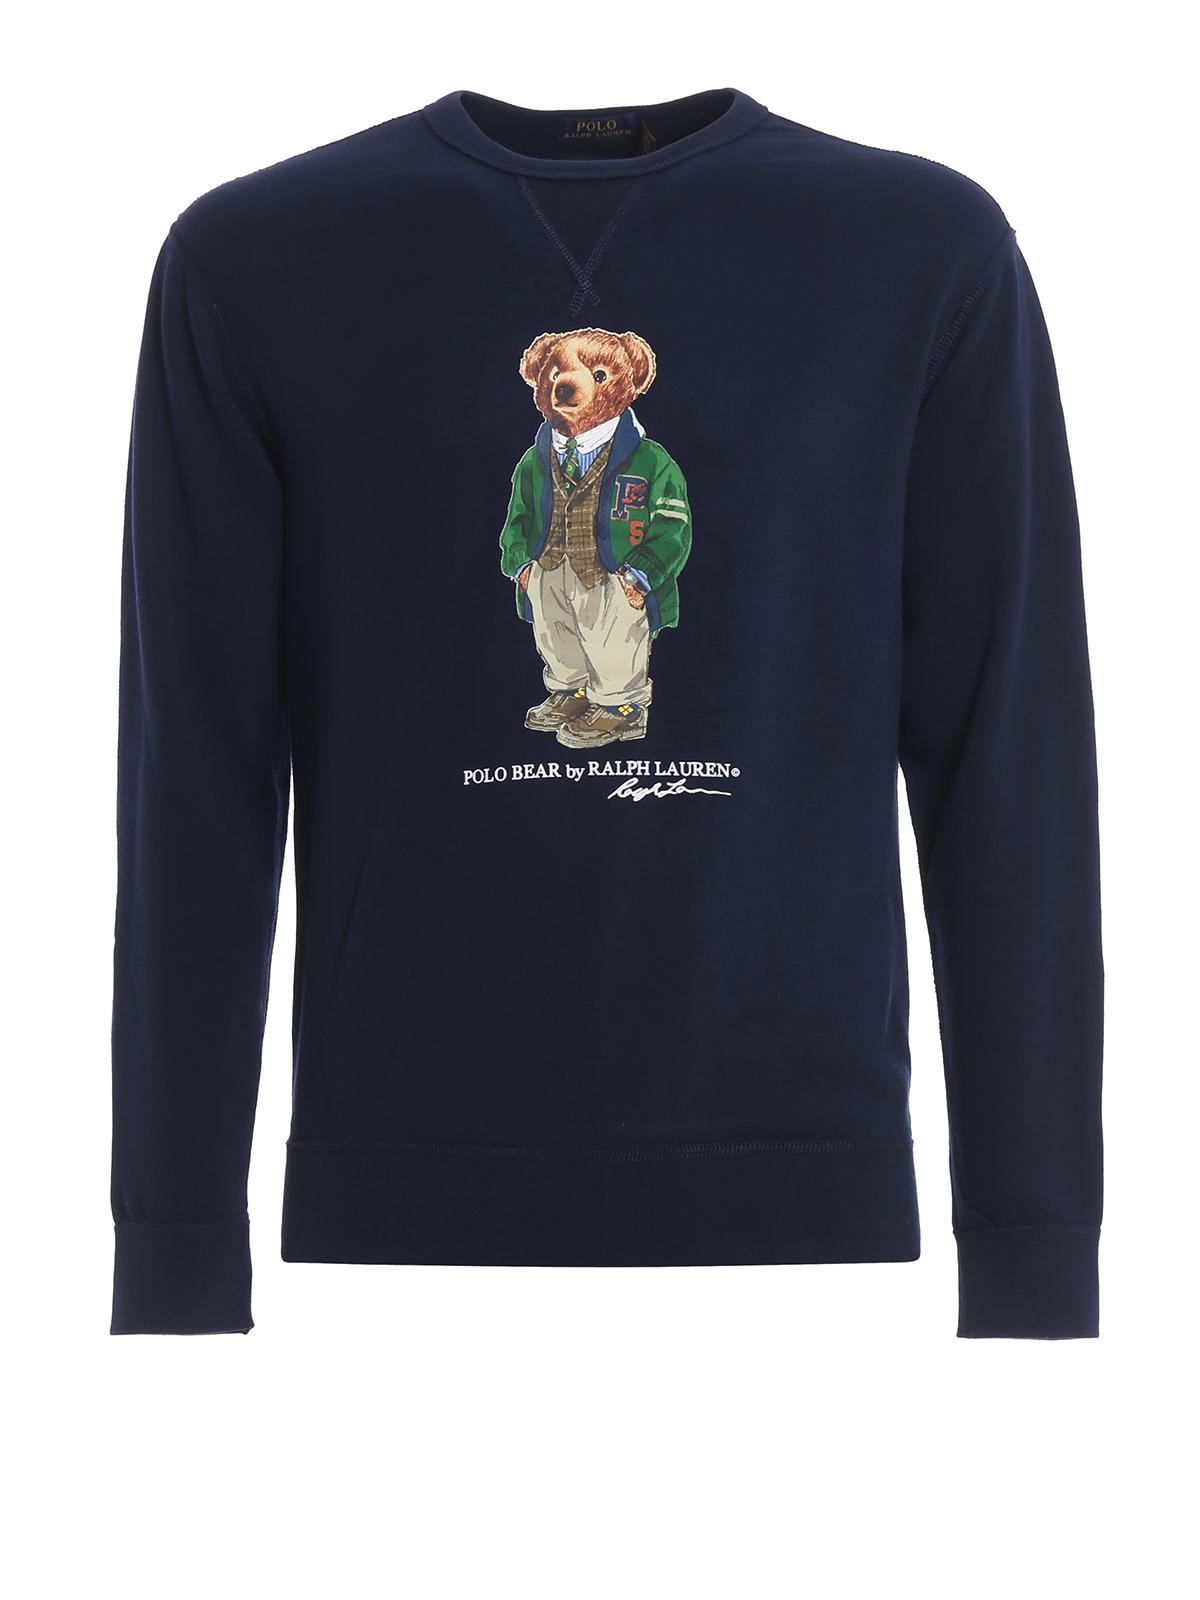 Pulls Sweat Shirts Bear Sweatshirtsamp; Polo Lauren Ralph jqLzVGpMSU